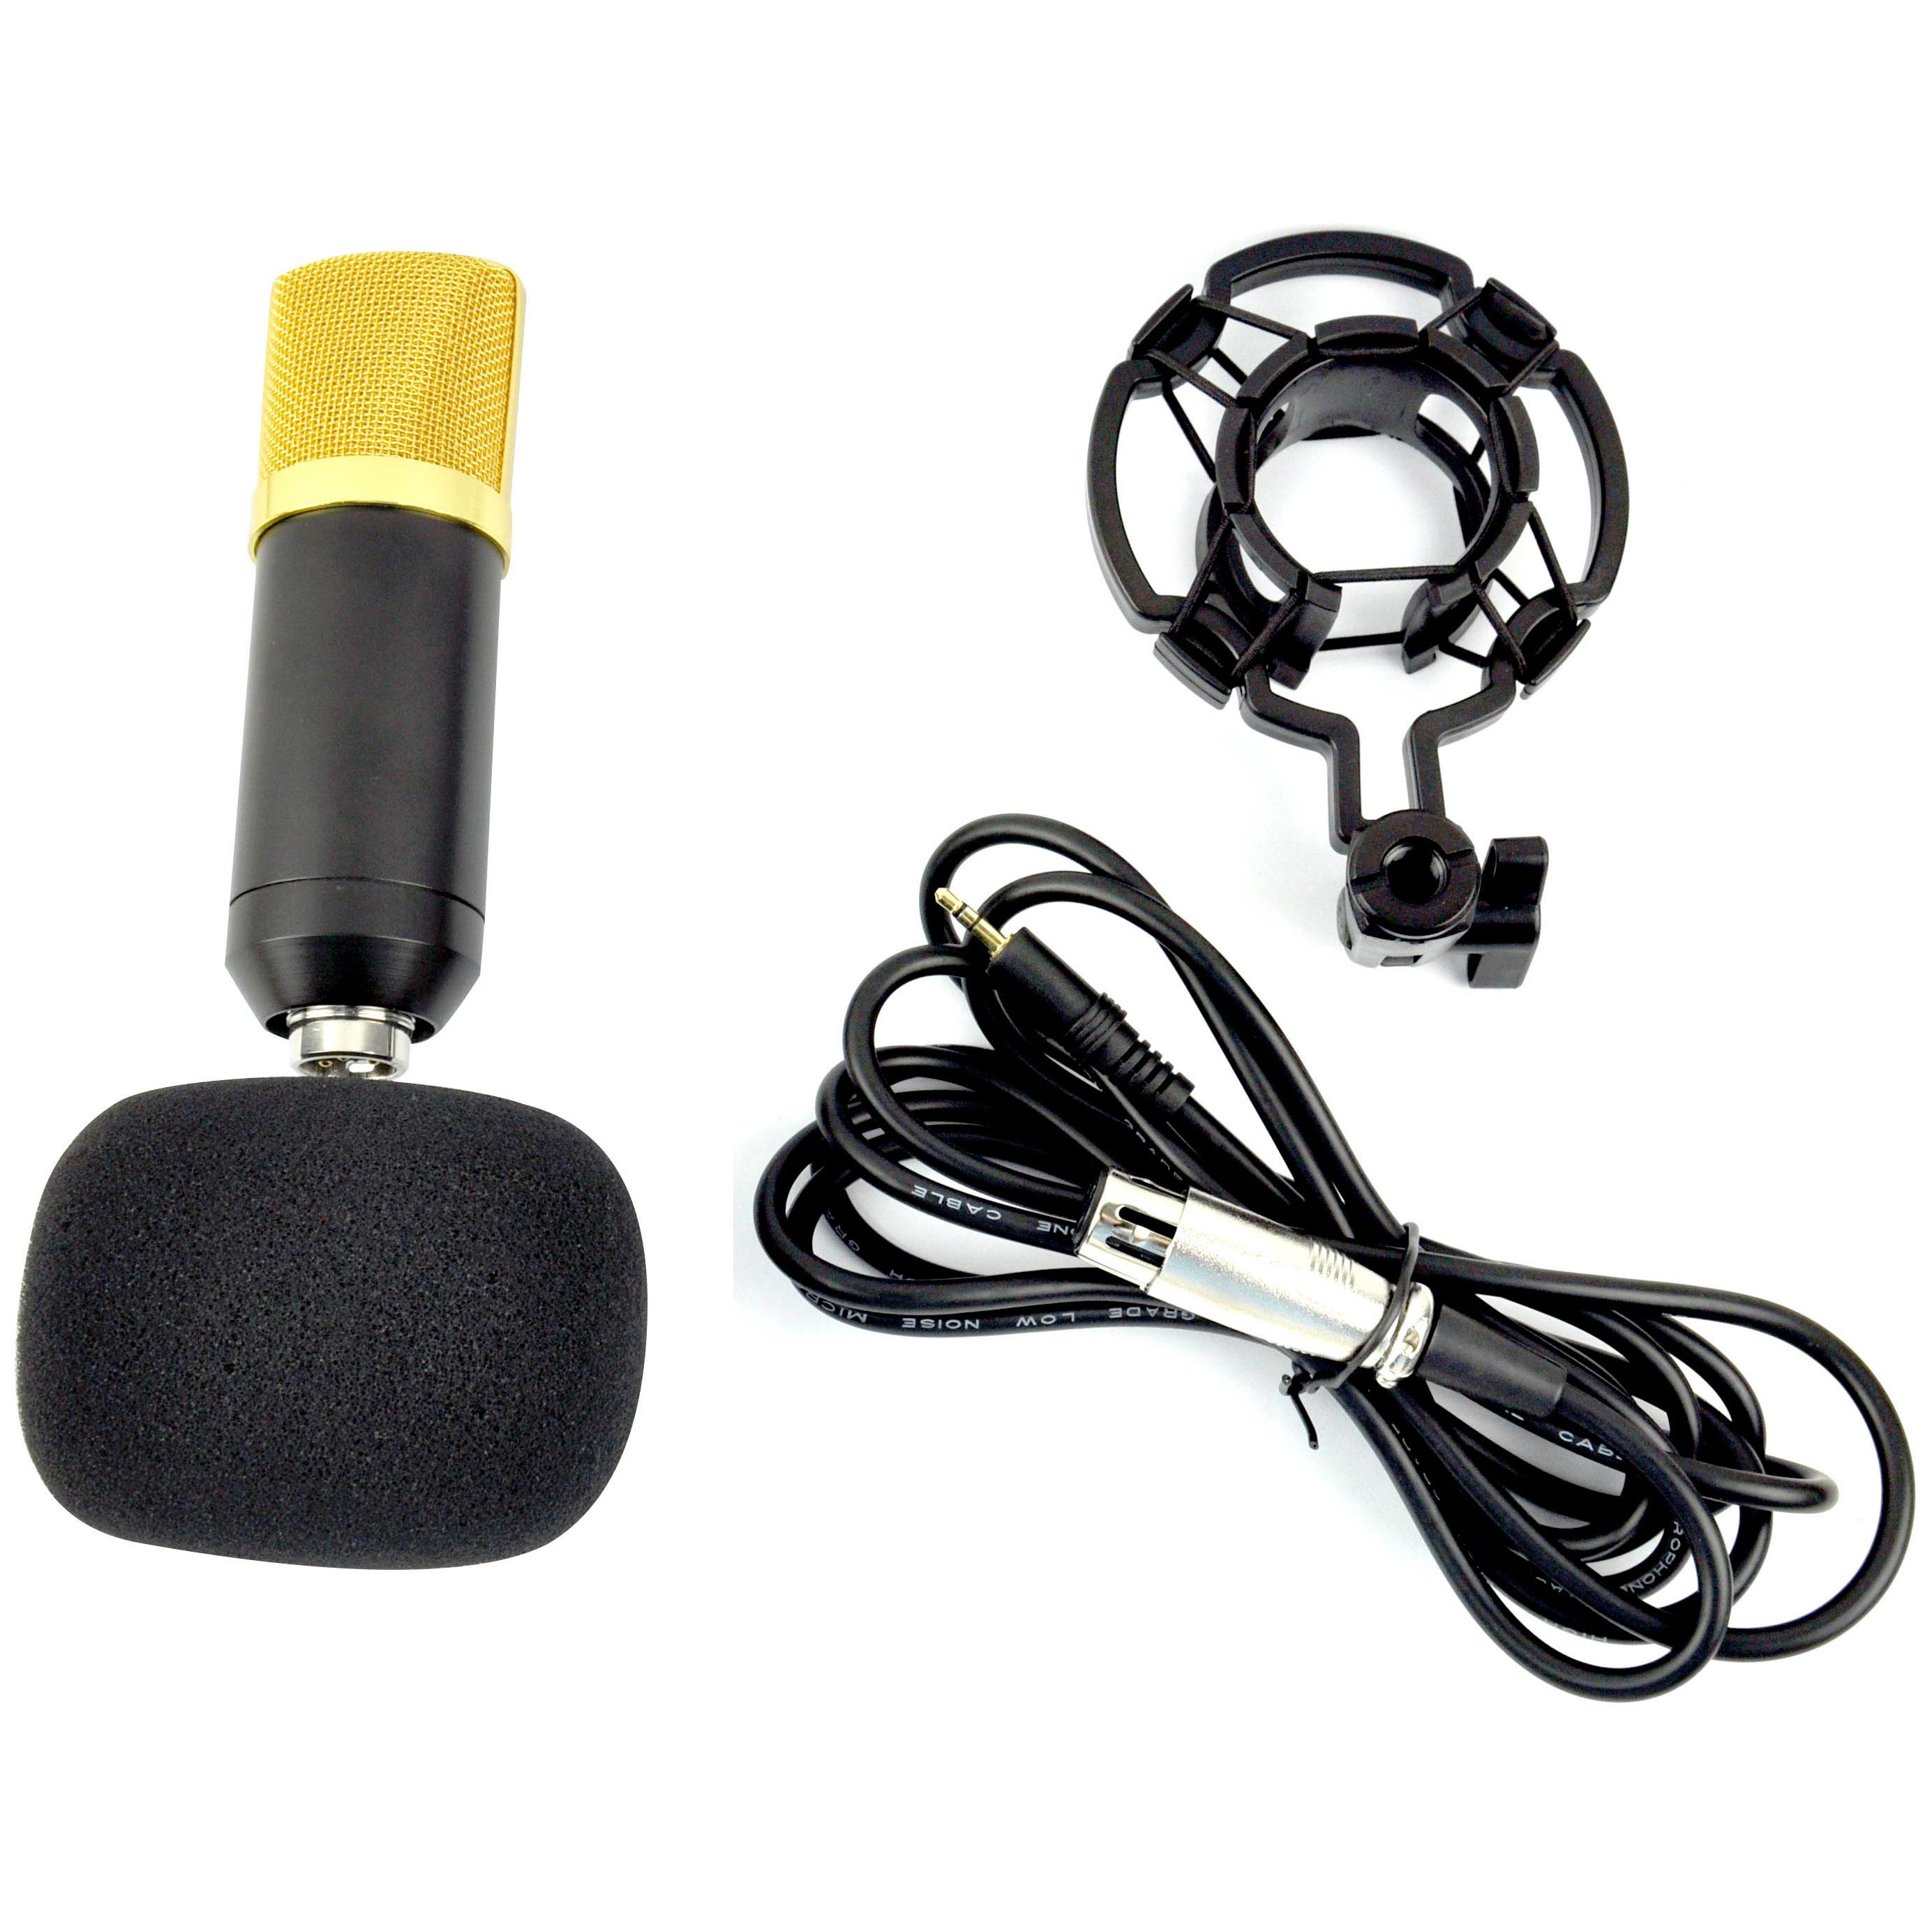 pro black condenser dynamic microphone mic sound studio recording shock mount 5055257526846 ebay. Black Bedroom Furniture Sets. Home Design Ideas